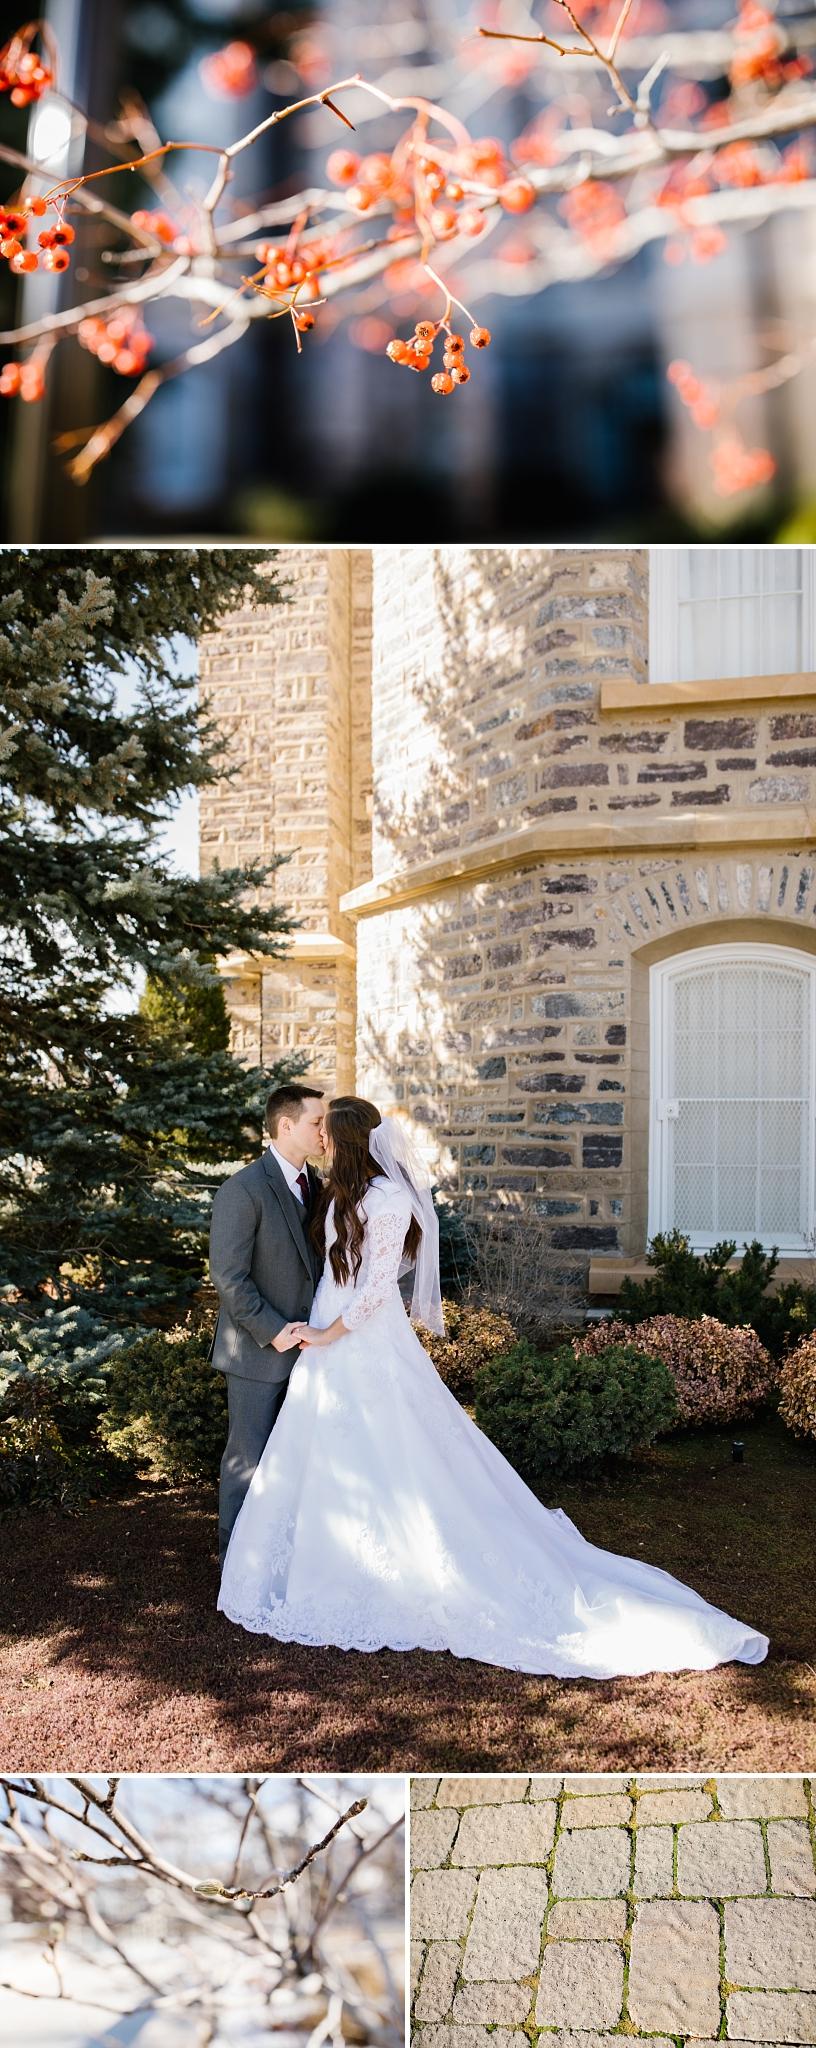 SS-Wedding-1_Lizzie-B-Imagery-Utah-Wedding-Photographer-Logan-Temple-Logan-Canyon-Mountain-Horse-Session.jpg